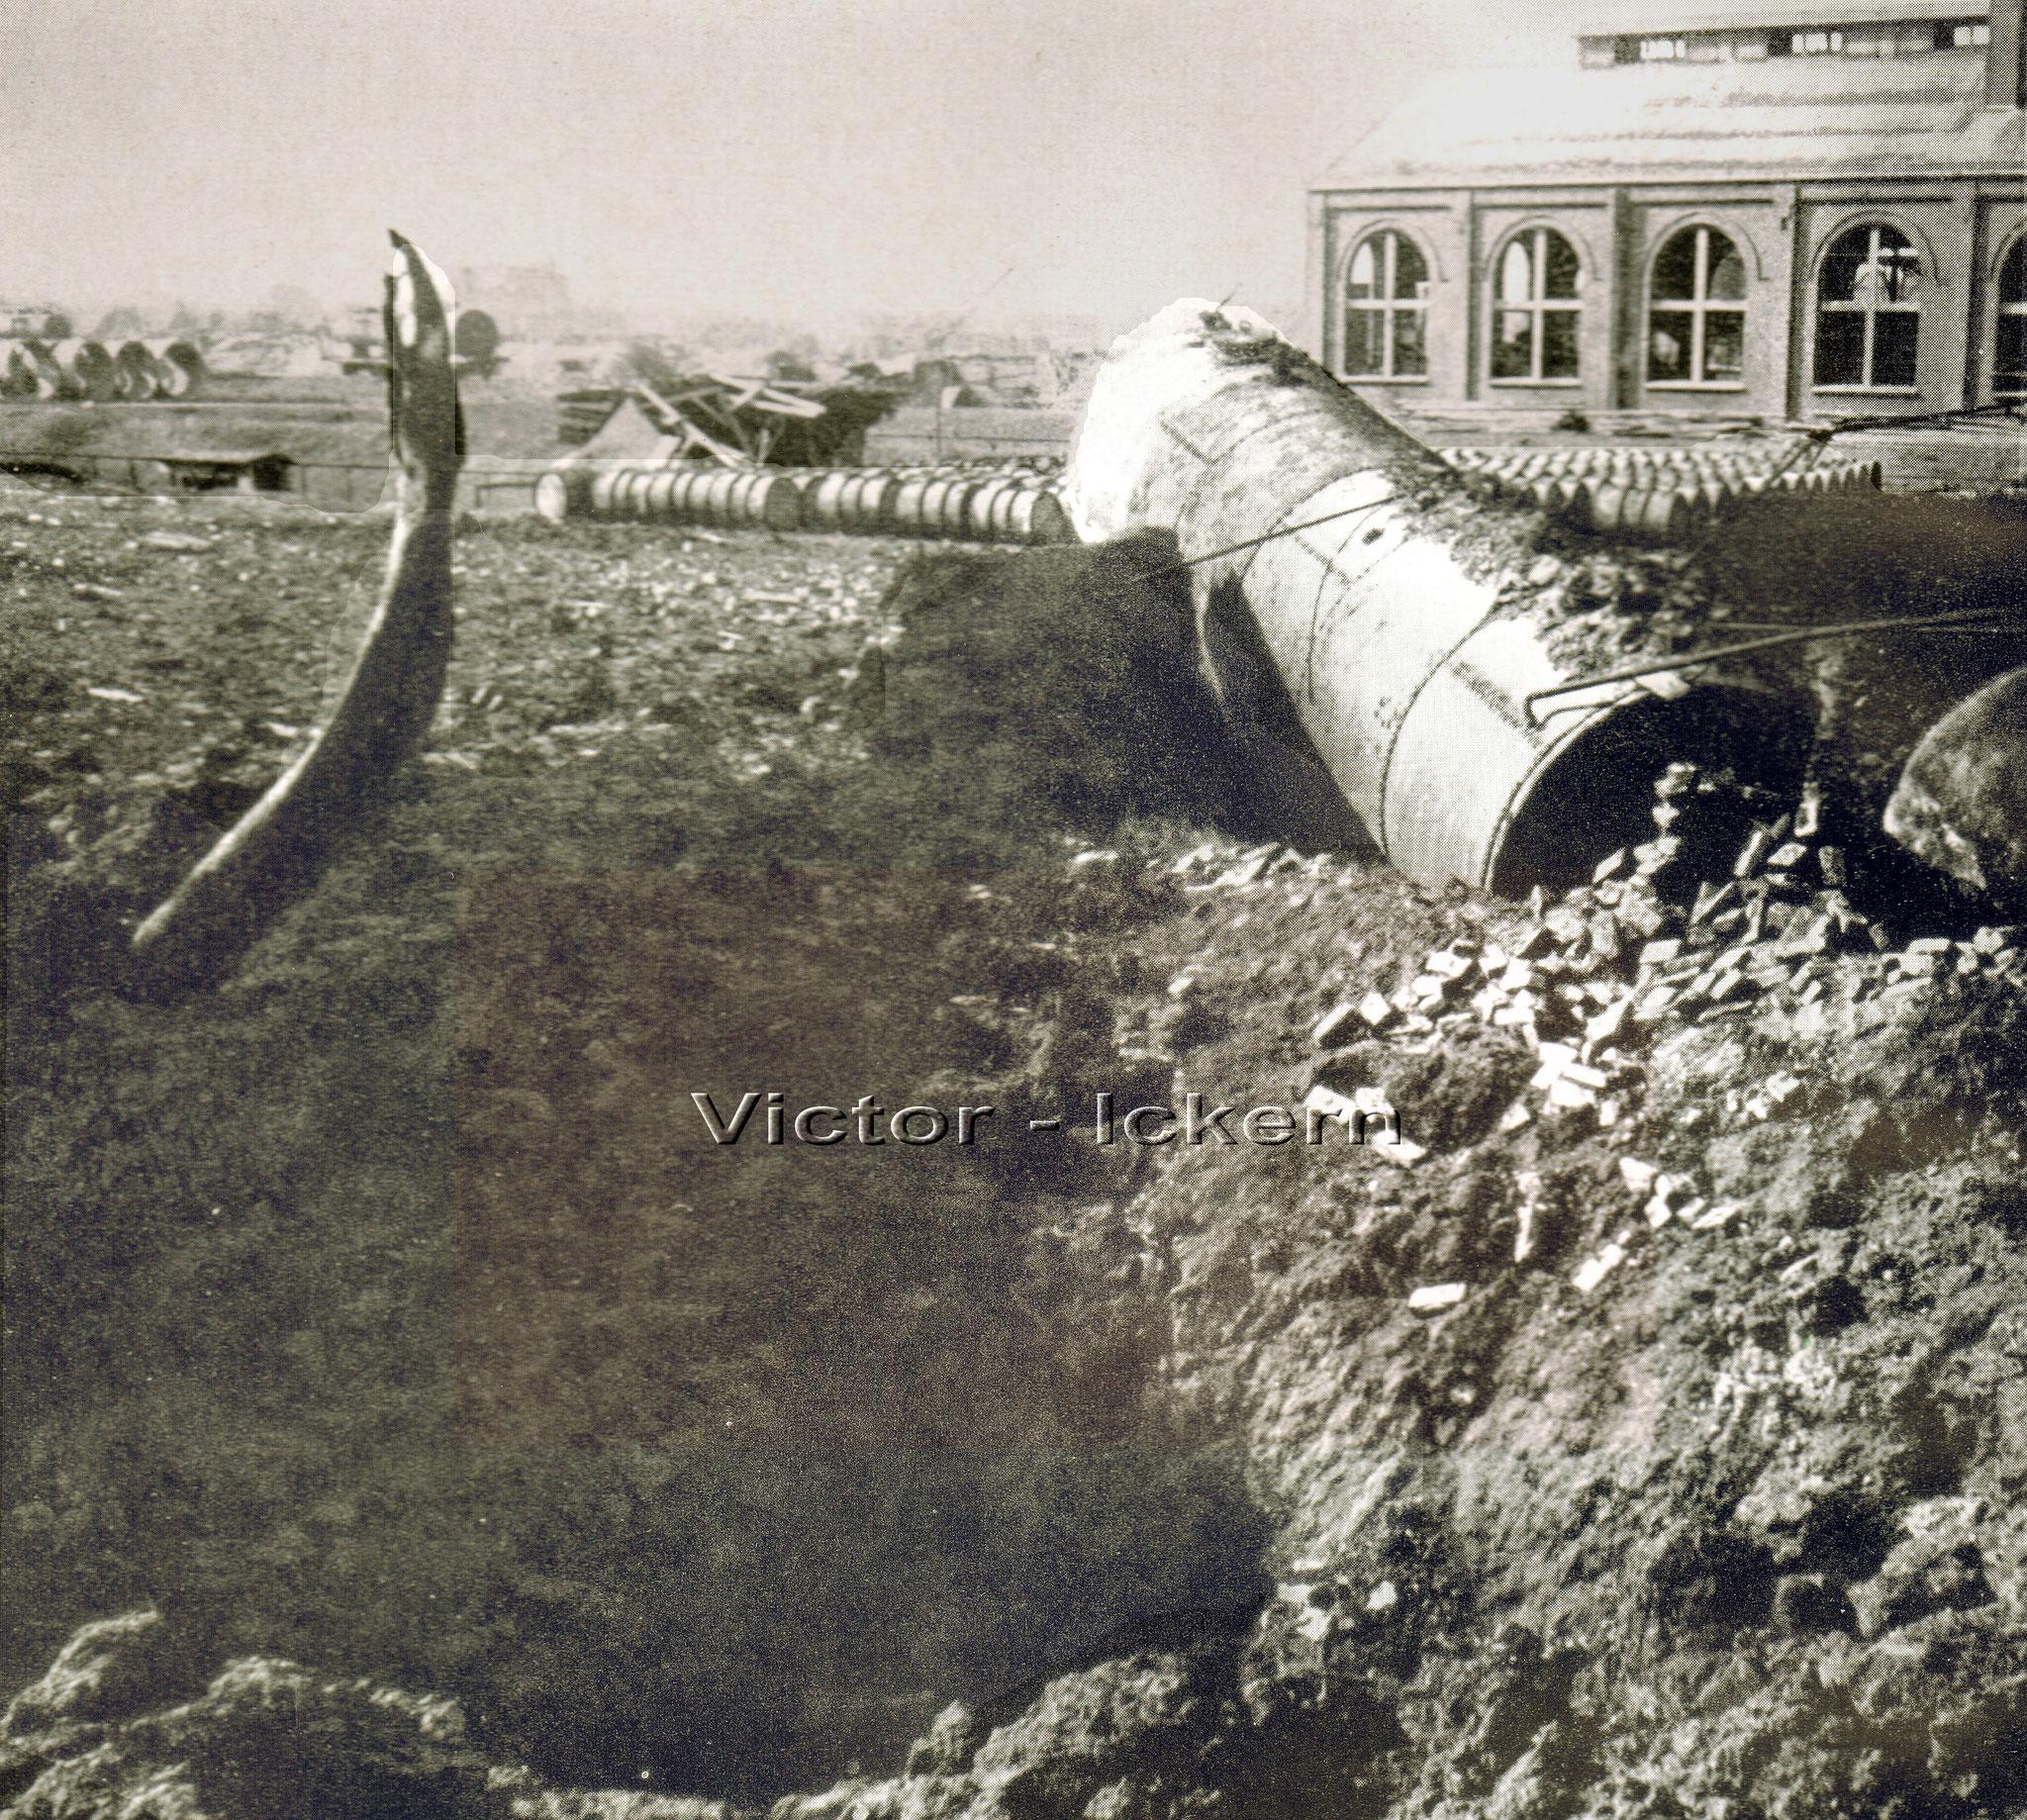 Zerstörtes Benzollager nach dem Bombenangriff vom 09.11.1944